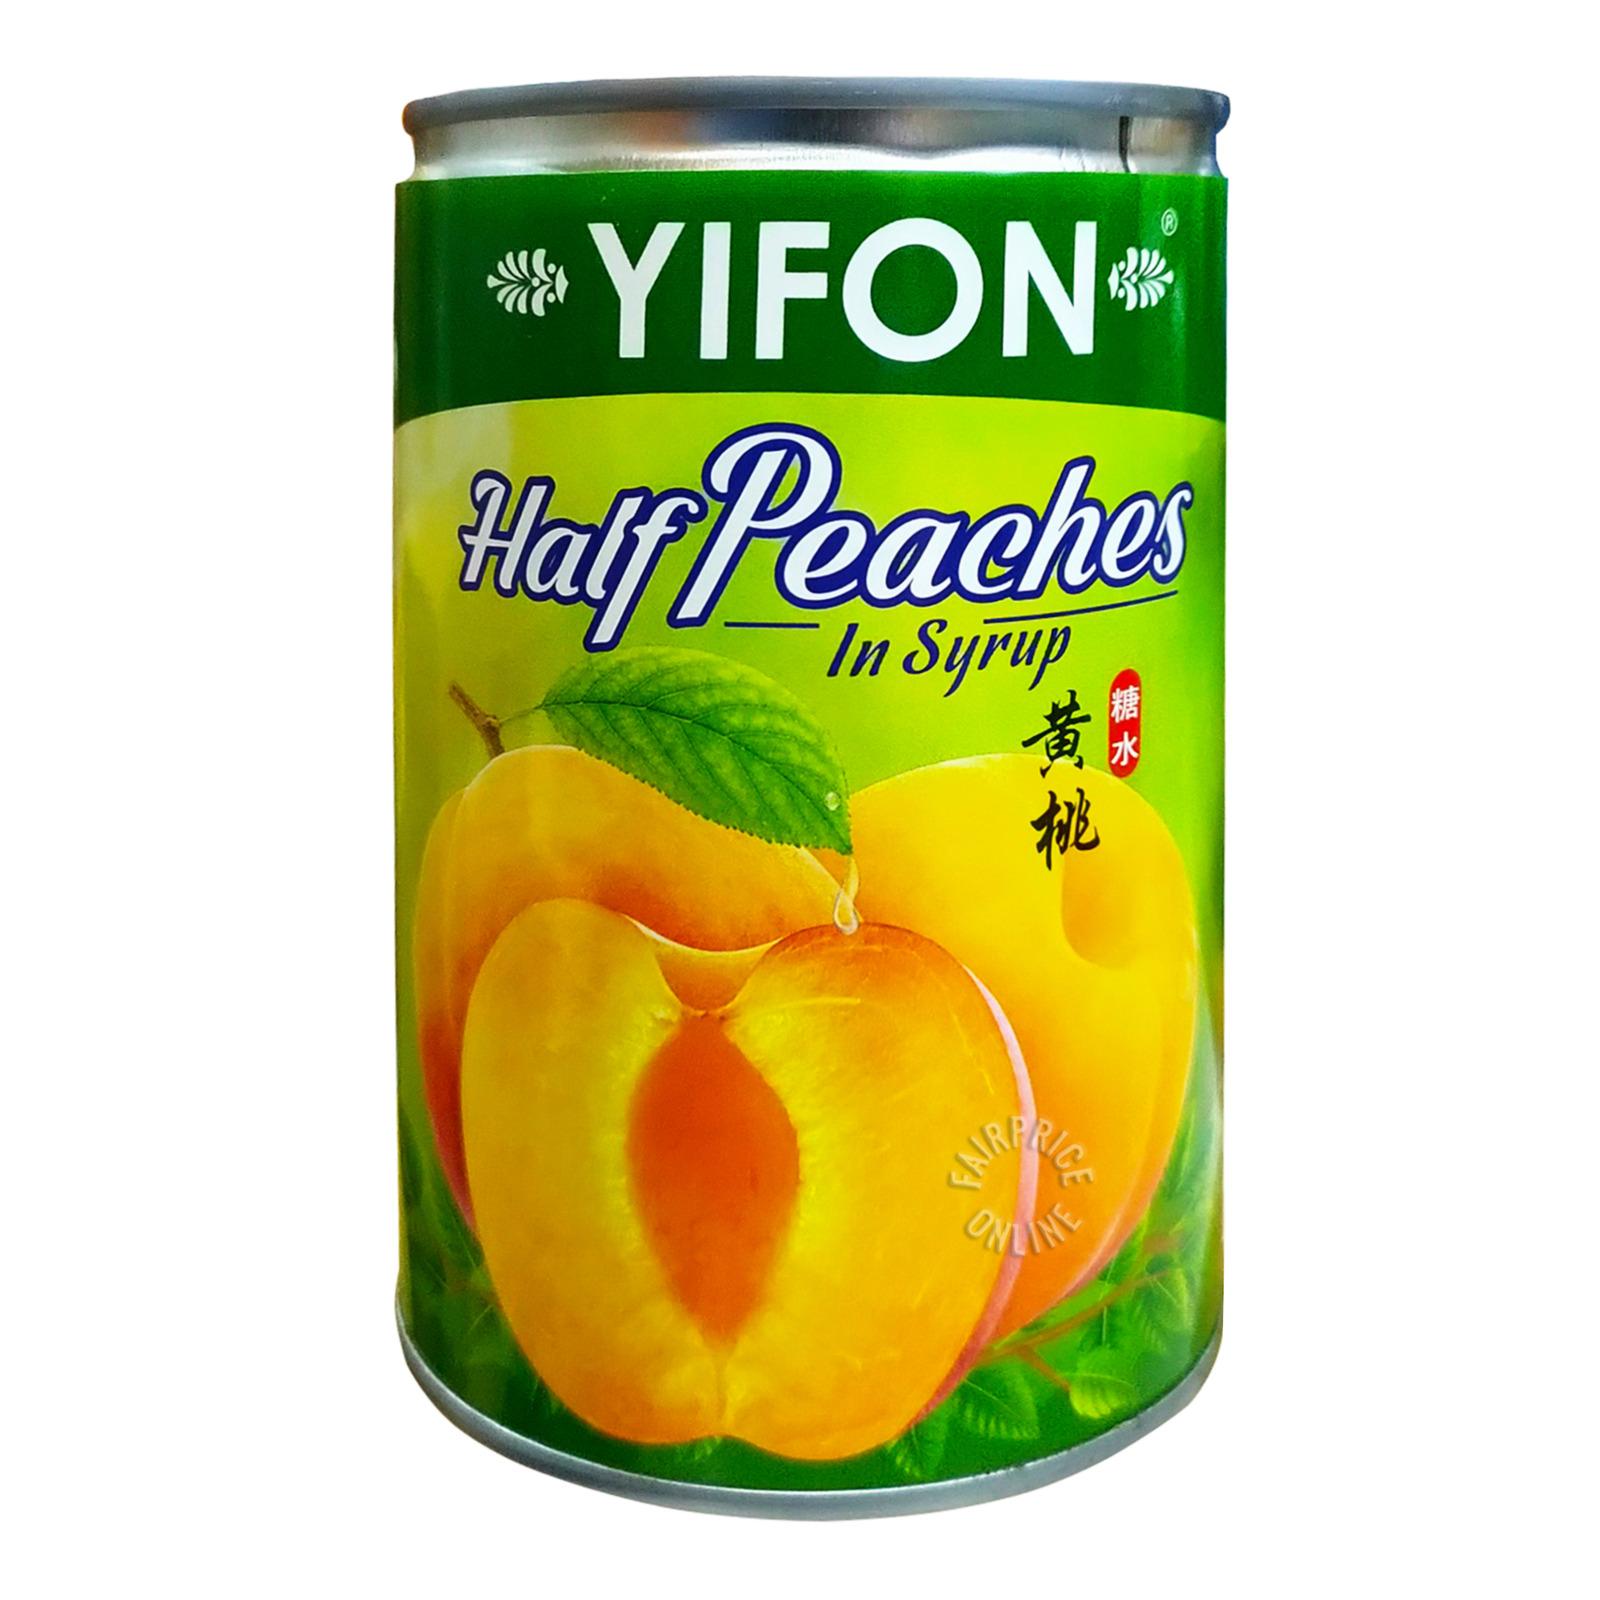 Yifon Half Peaches in Syrup